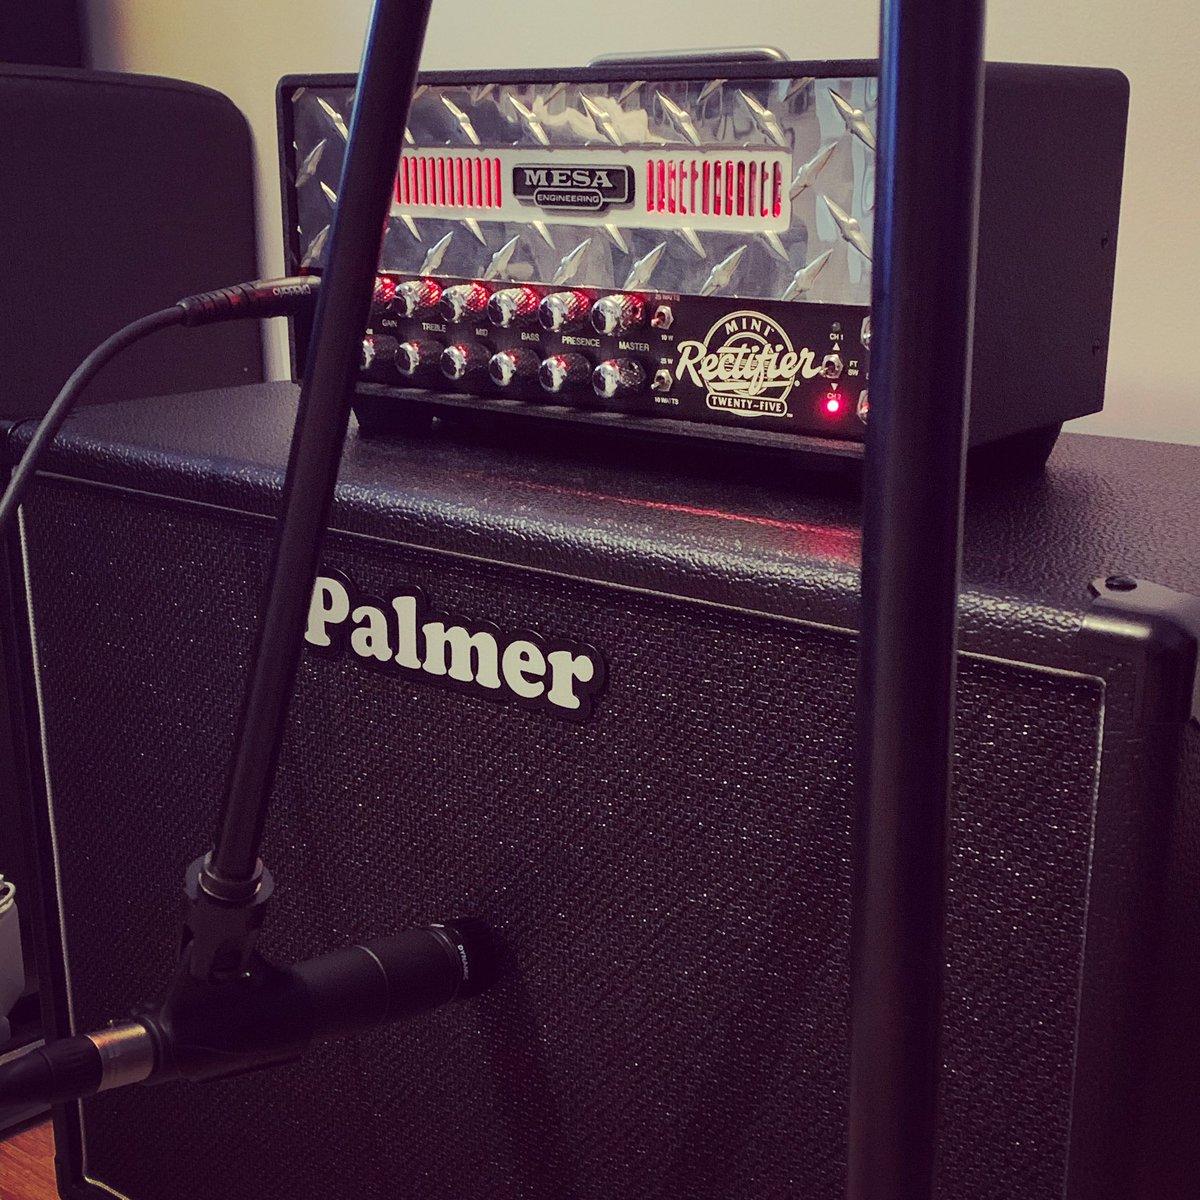 New weapon @MesaBoogie Something's coming with @Permanente_off #music #rock #mesaboogie #recording #record #recordingstudio #amplifier #headamp #preparation #studio #album #musique #sound #sonpic.twitter.com/kX9OVapNSW